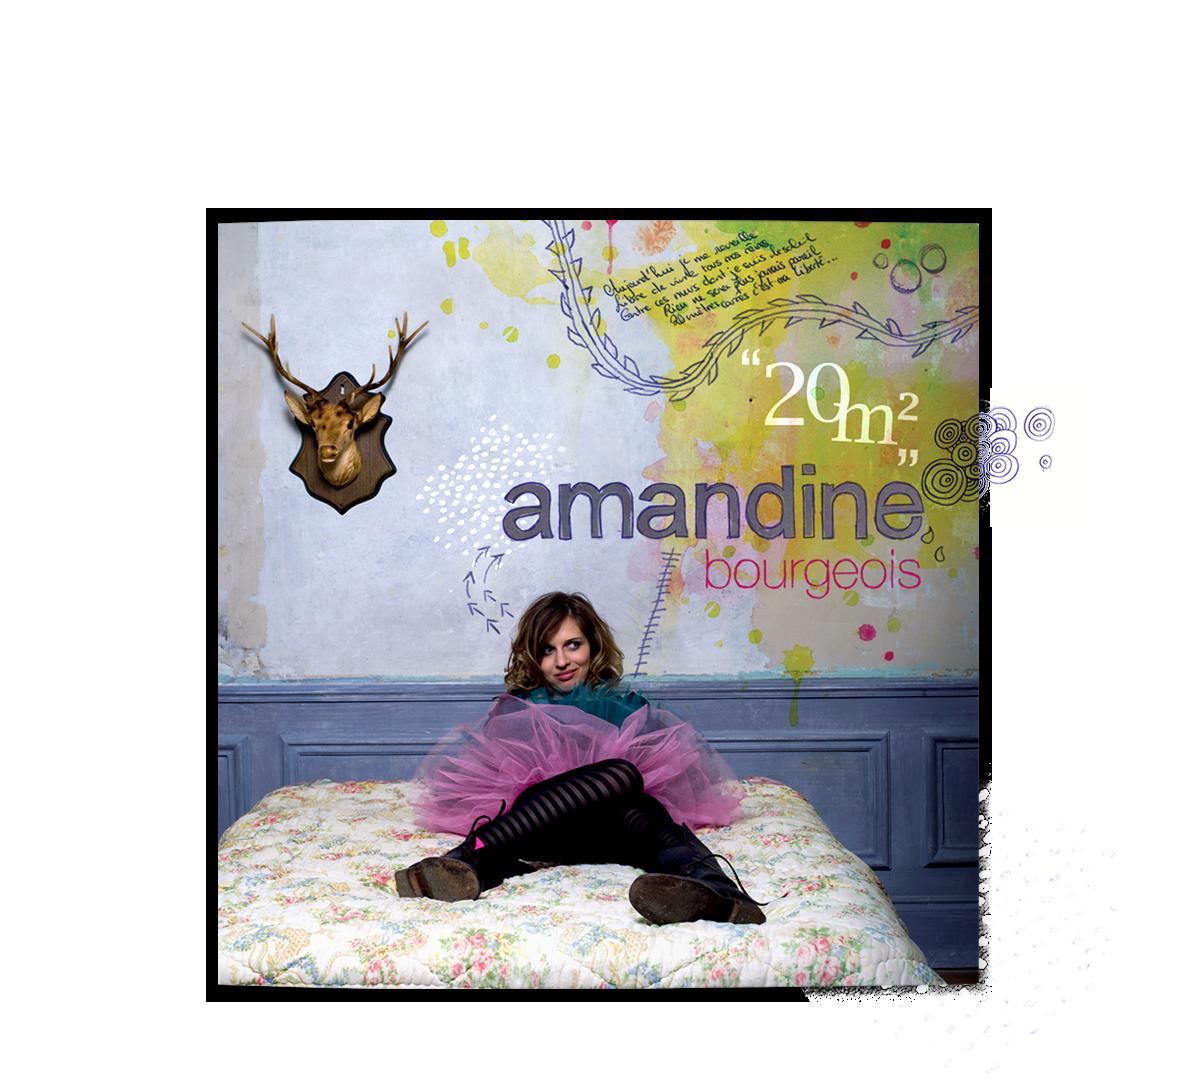 AMANDINE_1